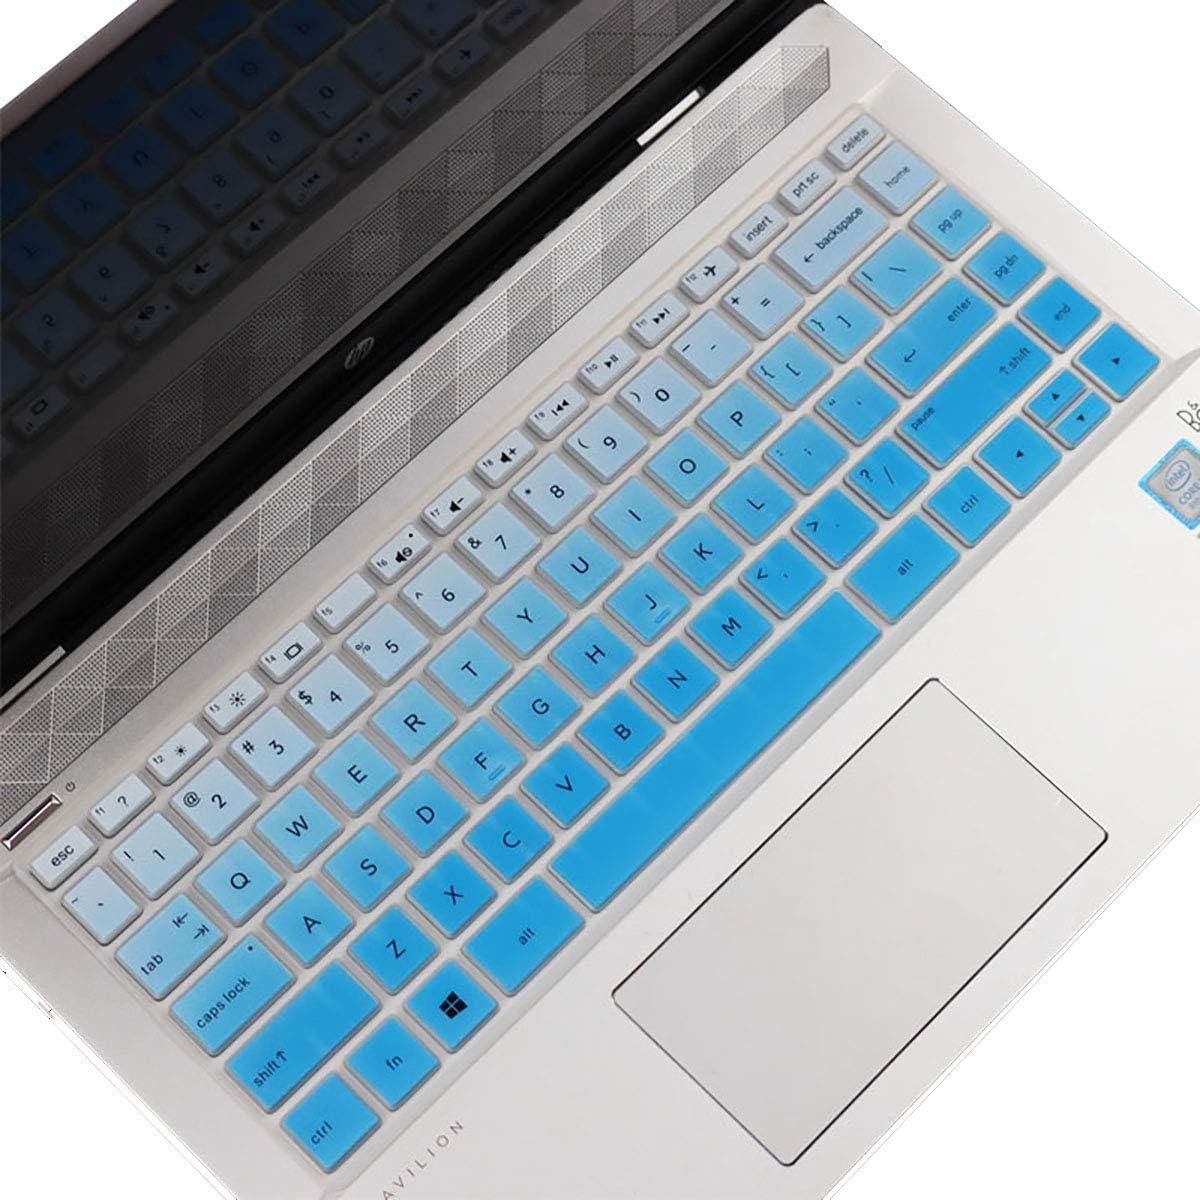 "Keyboard Cover Design for HP Pavilion x360 14"" Laptop 14M-BA 14M-CD 14-BF 14-BW 14-cm Series 14M-BA011DX 14M-BA013DX 14M-BA015DX 14M-BA114DX 14M-CD0001DX 14M-CD0003DX -Gradual Blue"